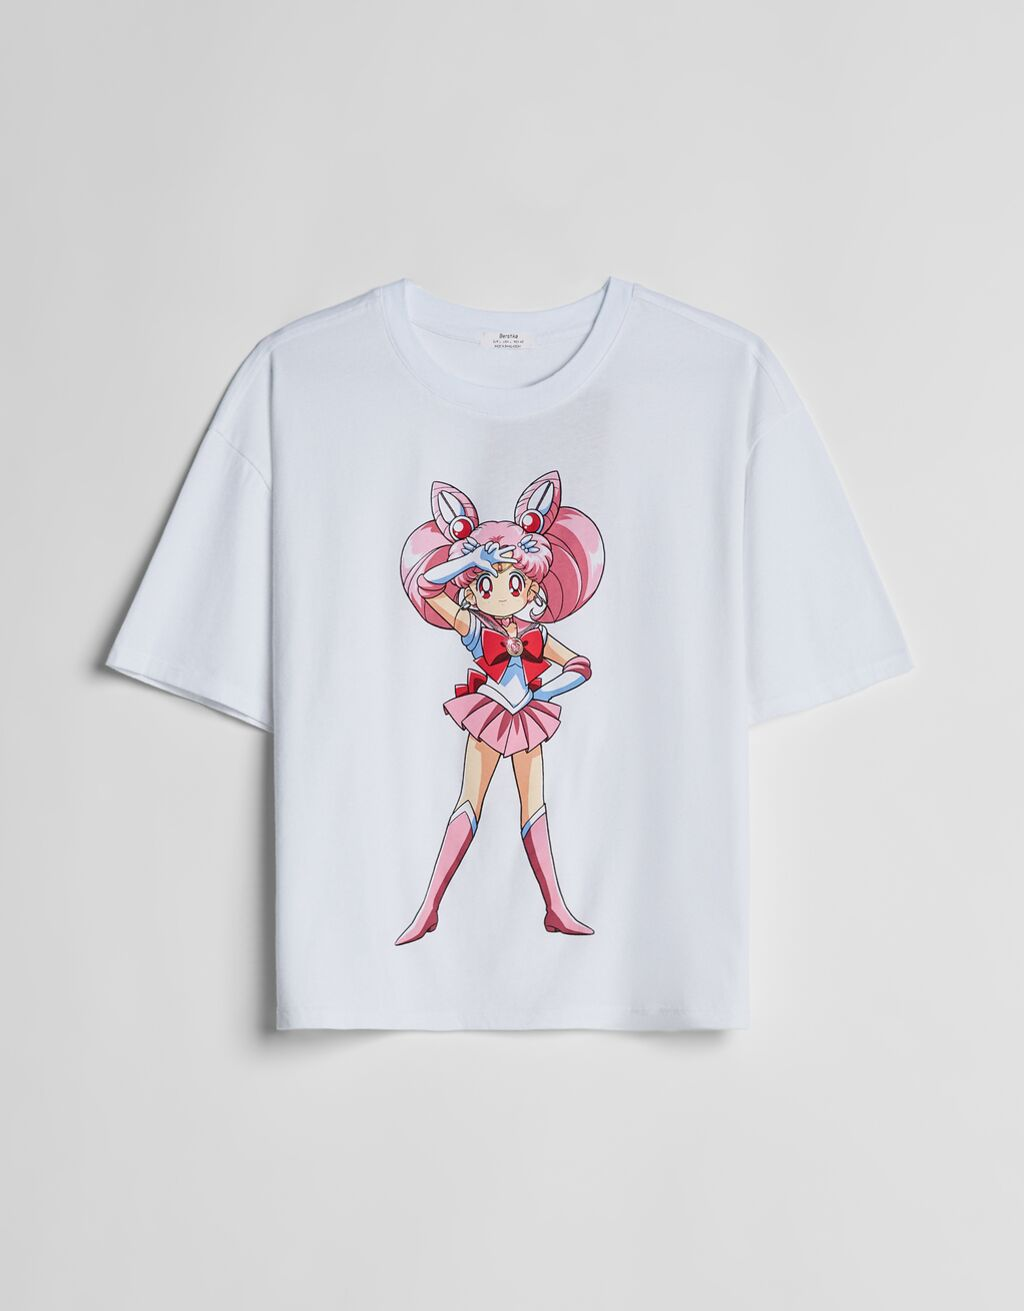 Camiseta manga corta Sailor Moon.